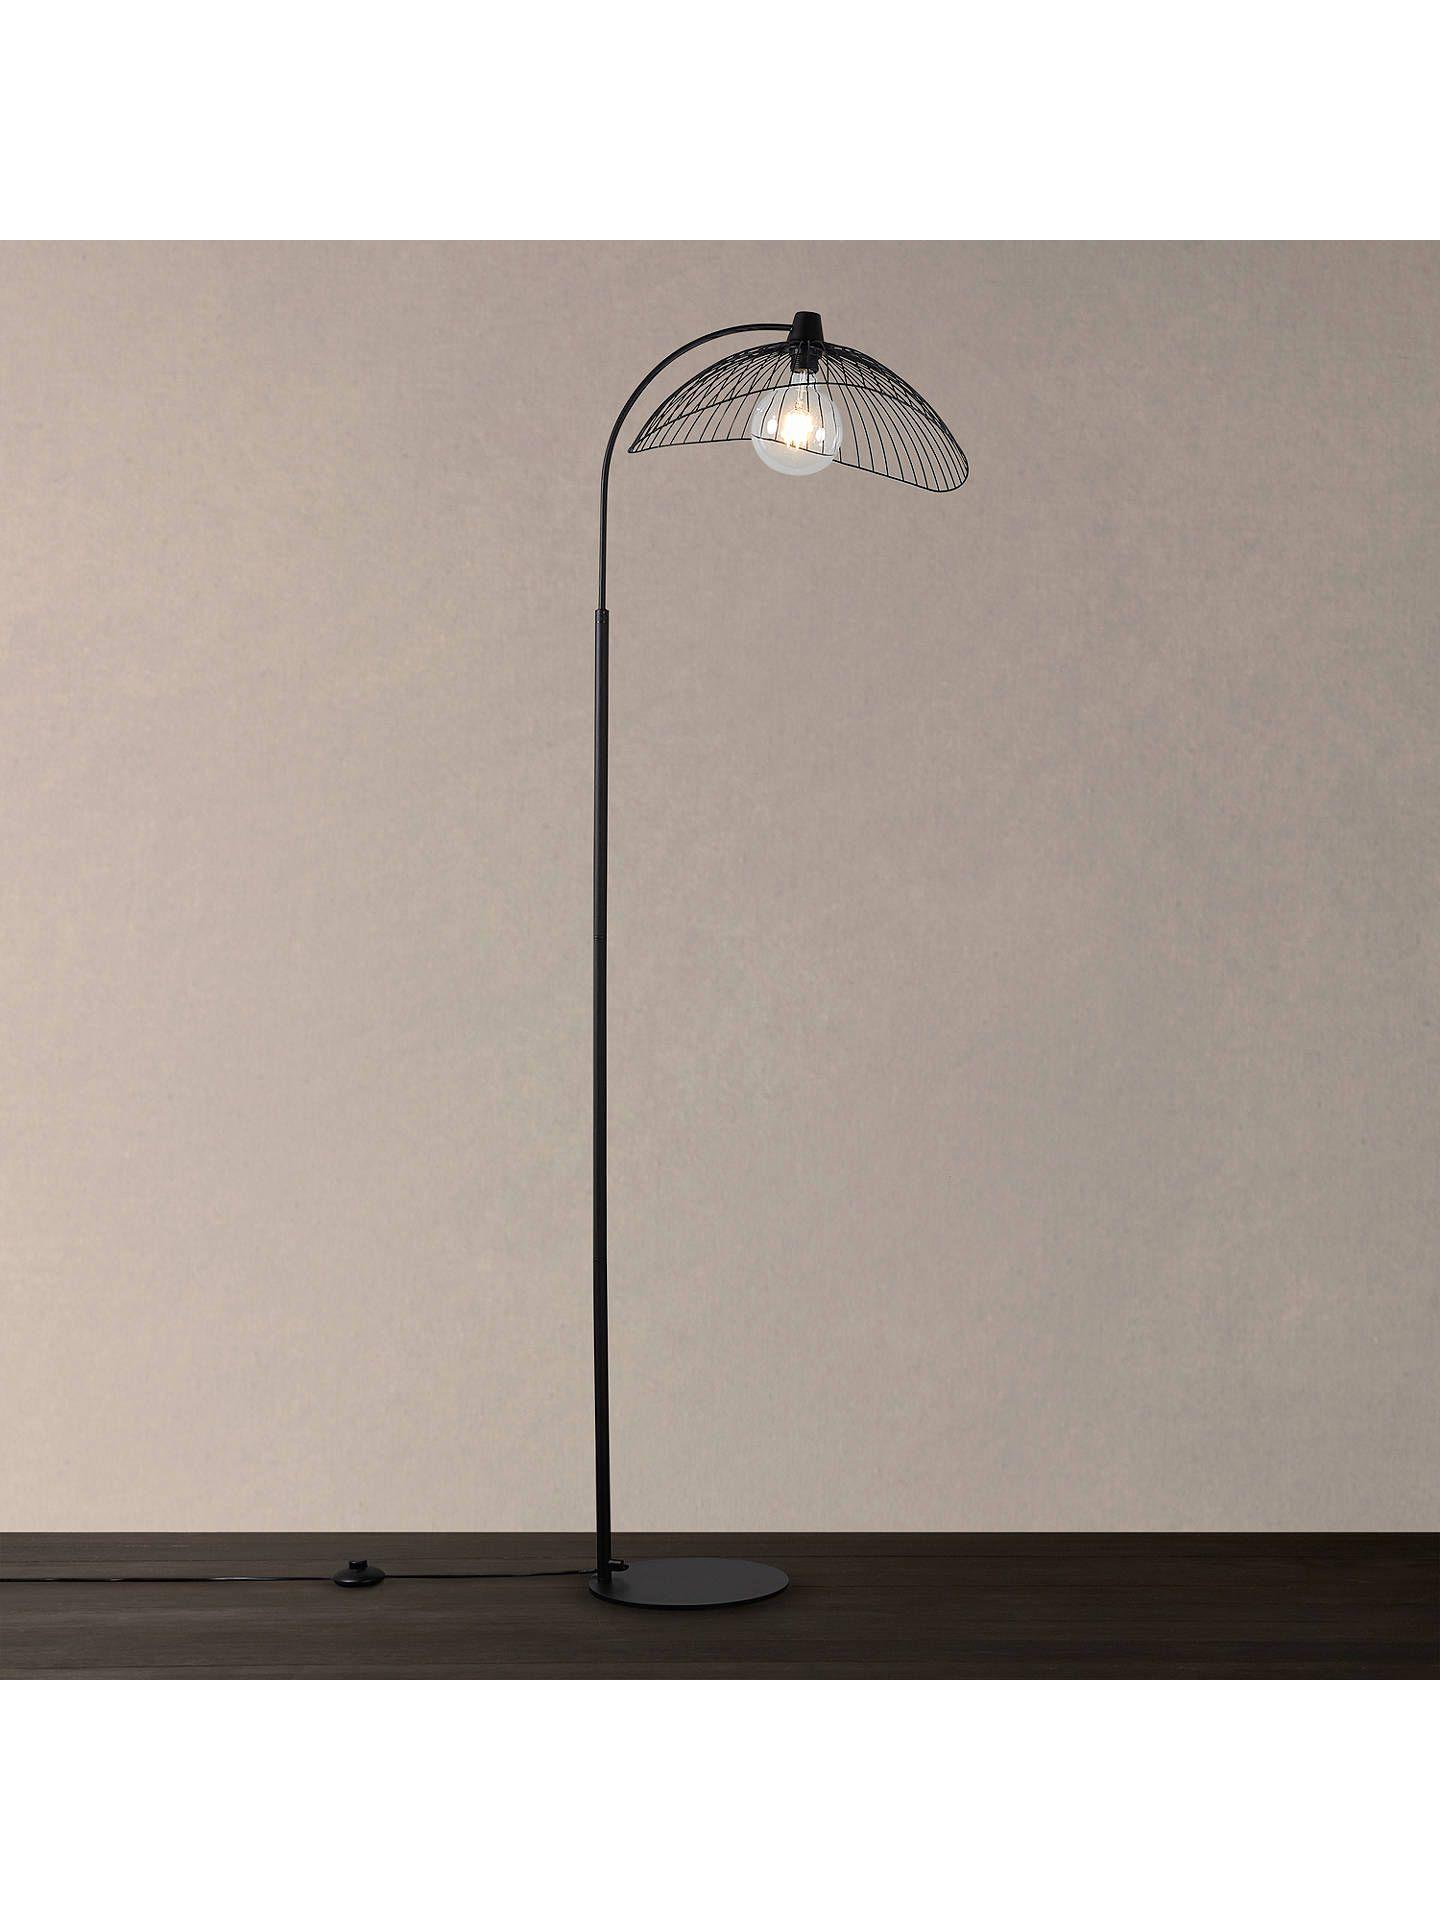 da0da17e257a BuyJohn Lewis & Partners Hiko Floor Lamp, Black Online at johnlewis.com